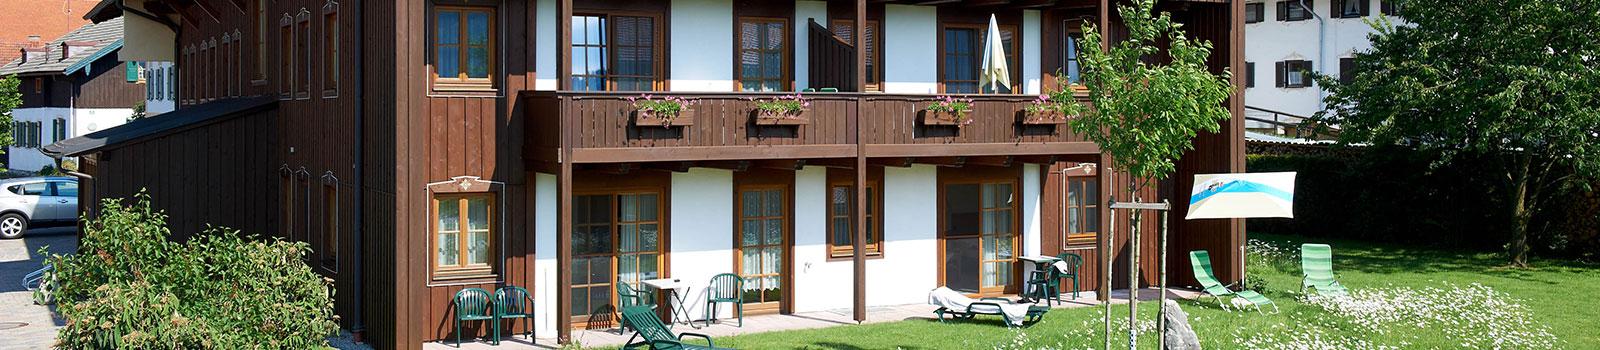 Prillerhof - Ferienhotel garni ***superior